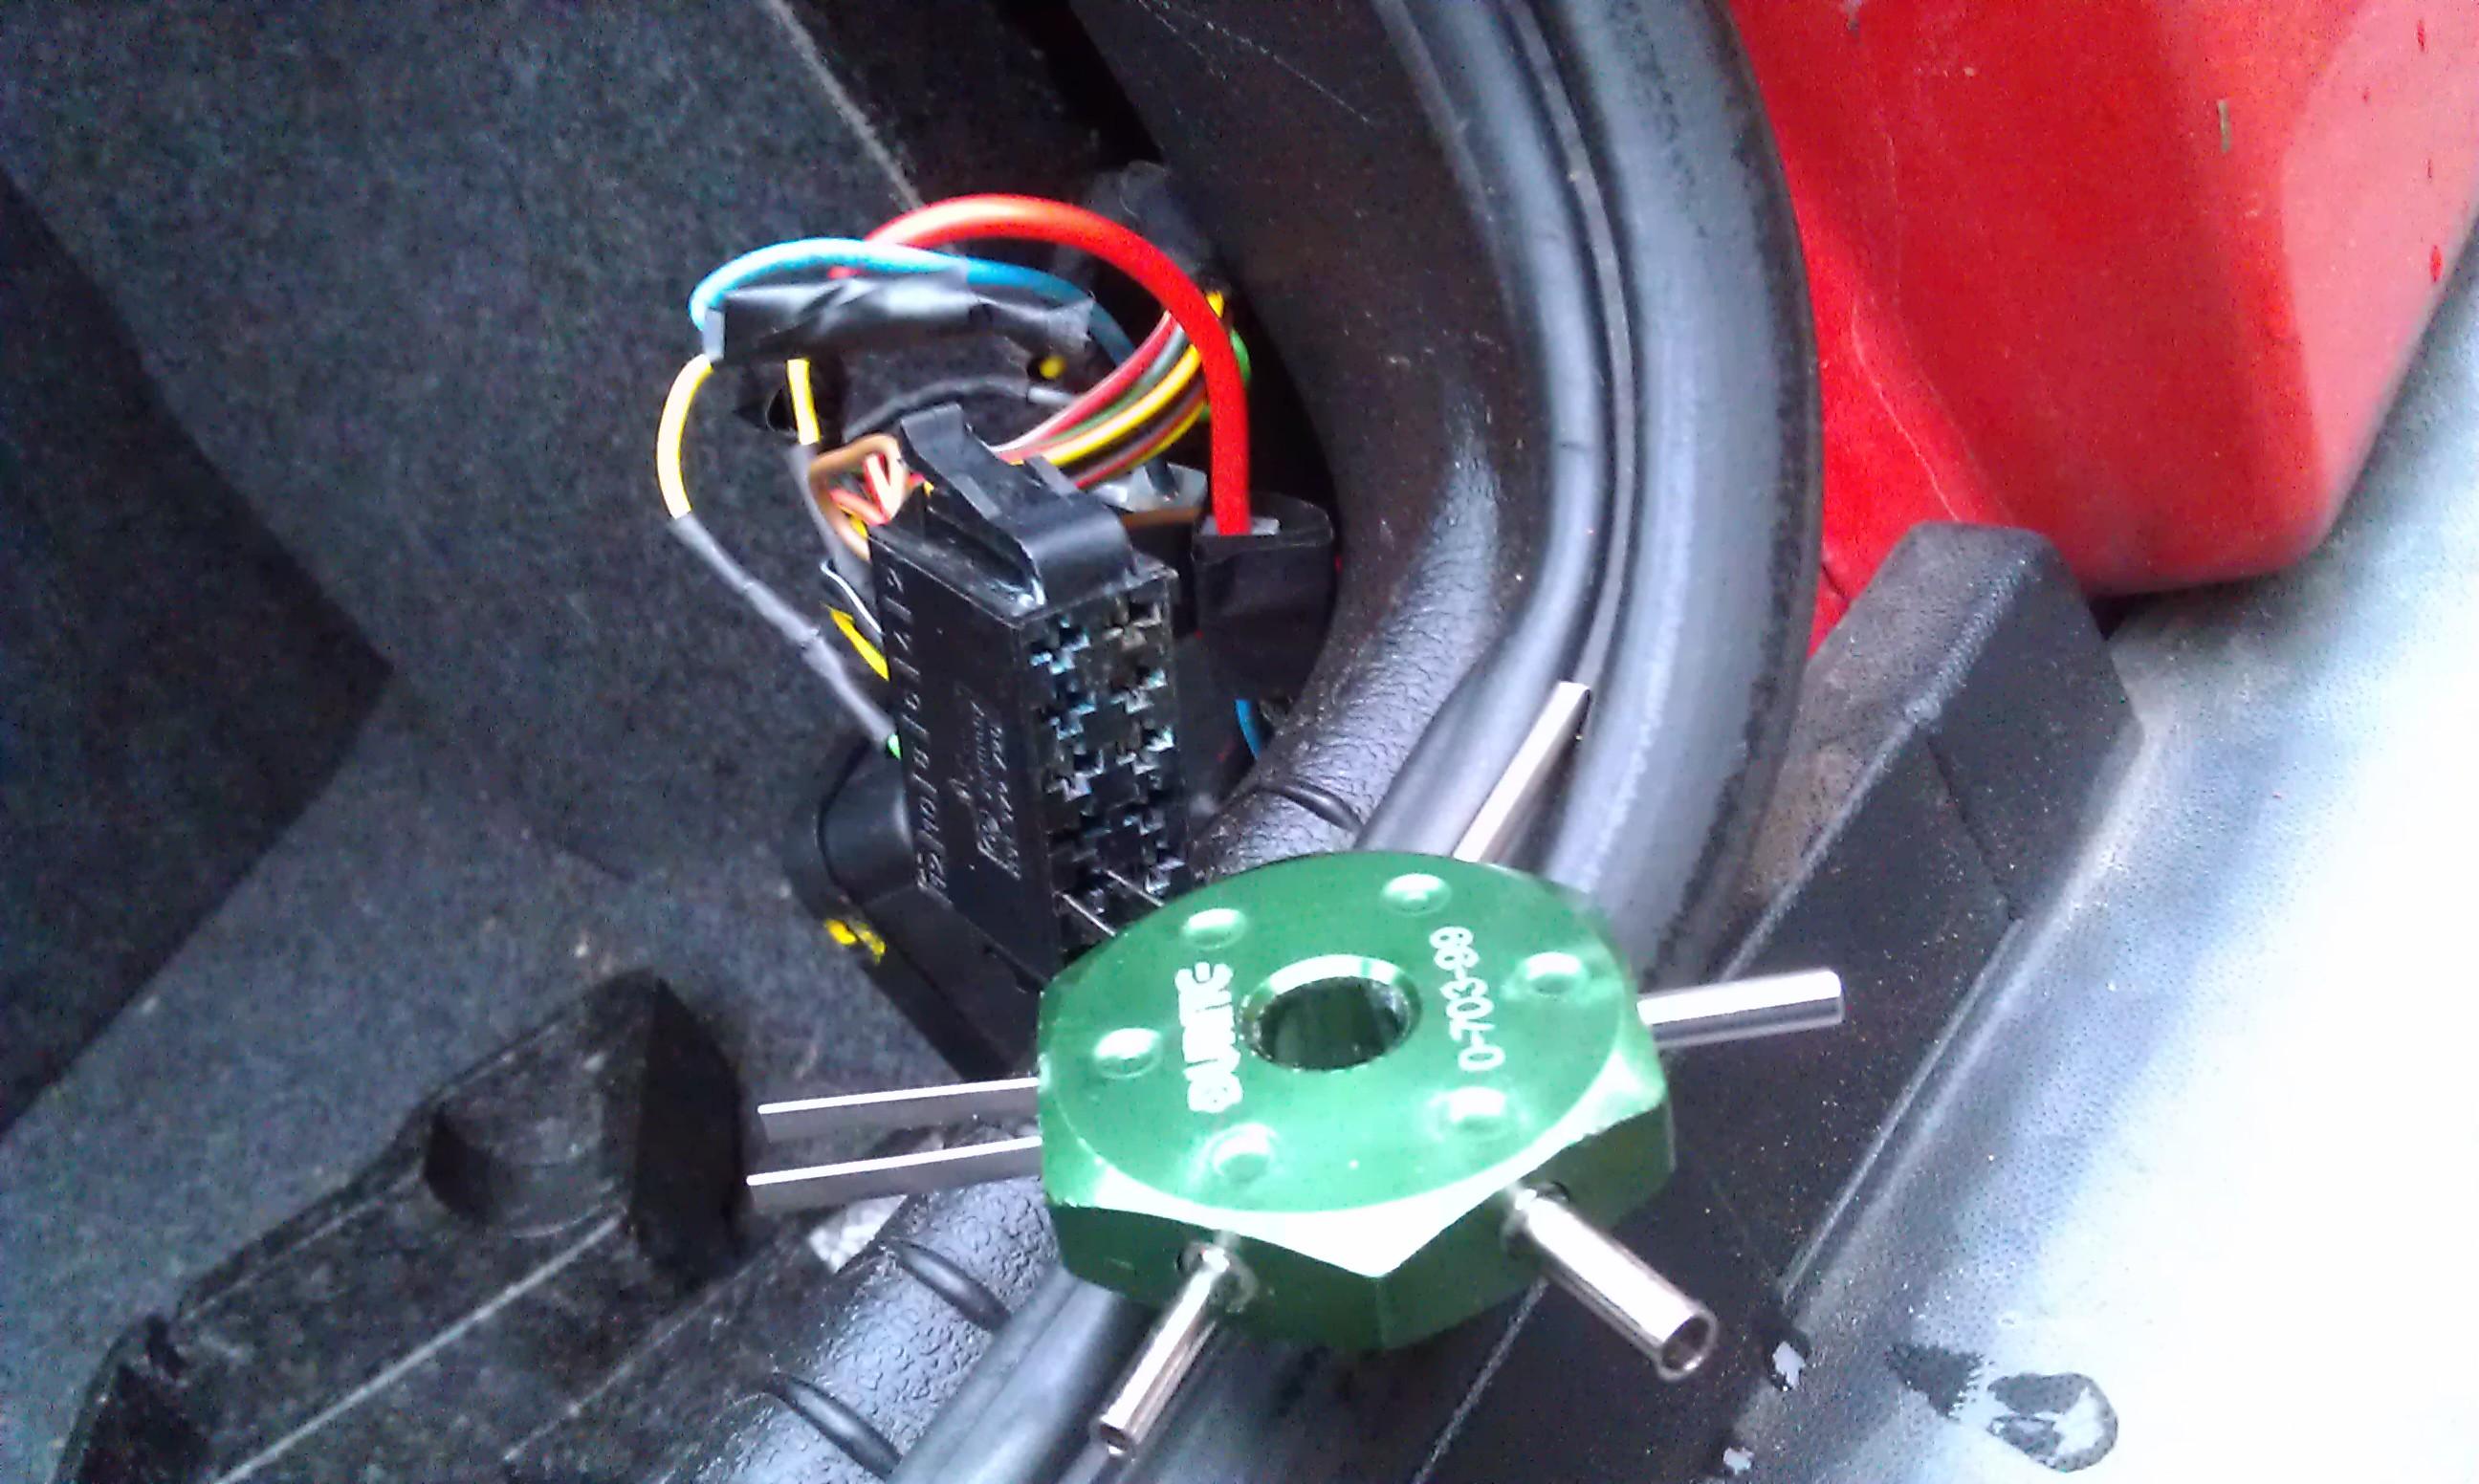 vw electrical connectors javalins s blog rh javalins wordpress com  vw wiring harness connectors